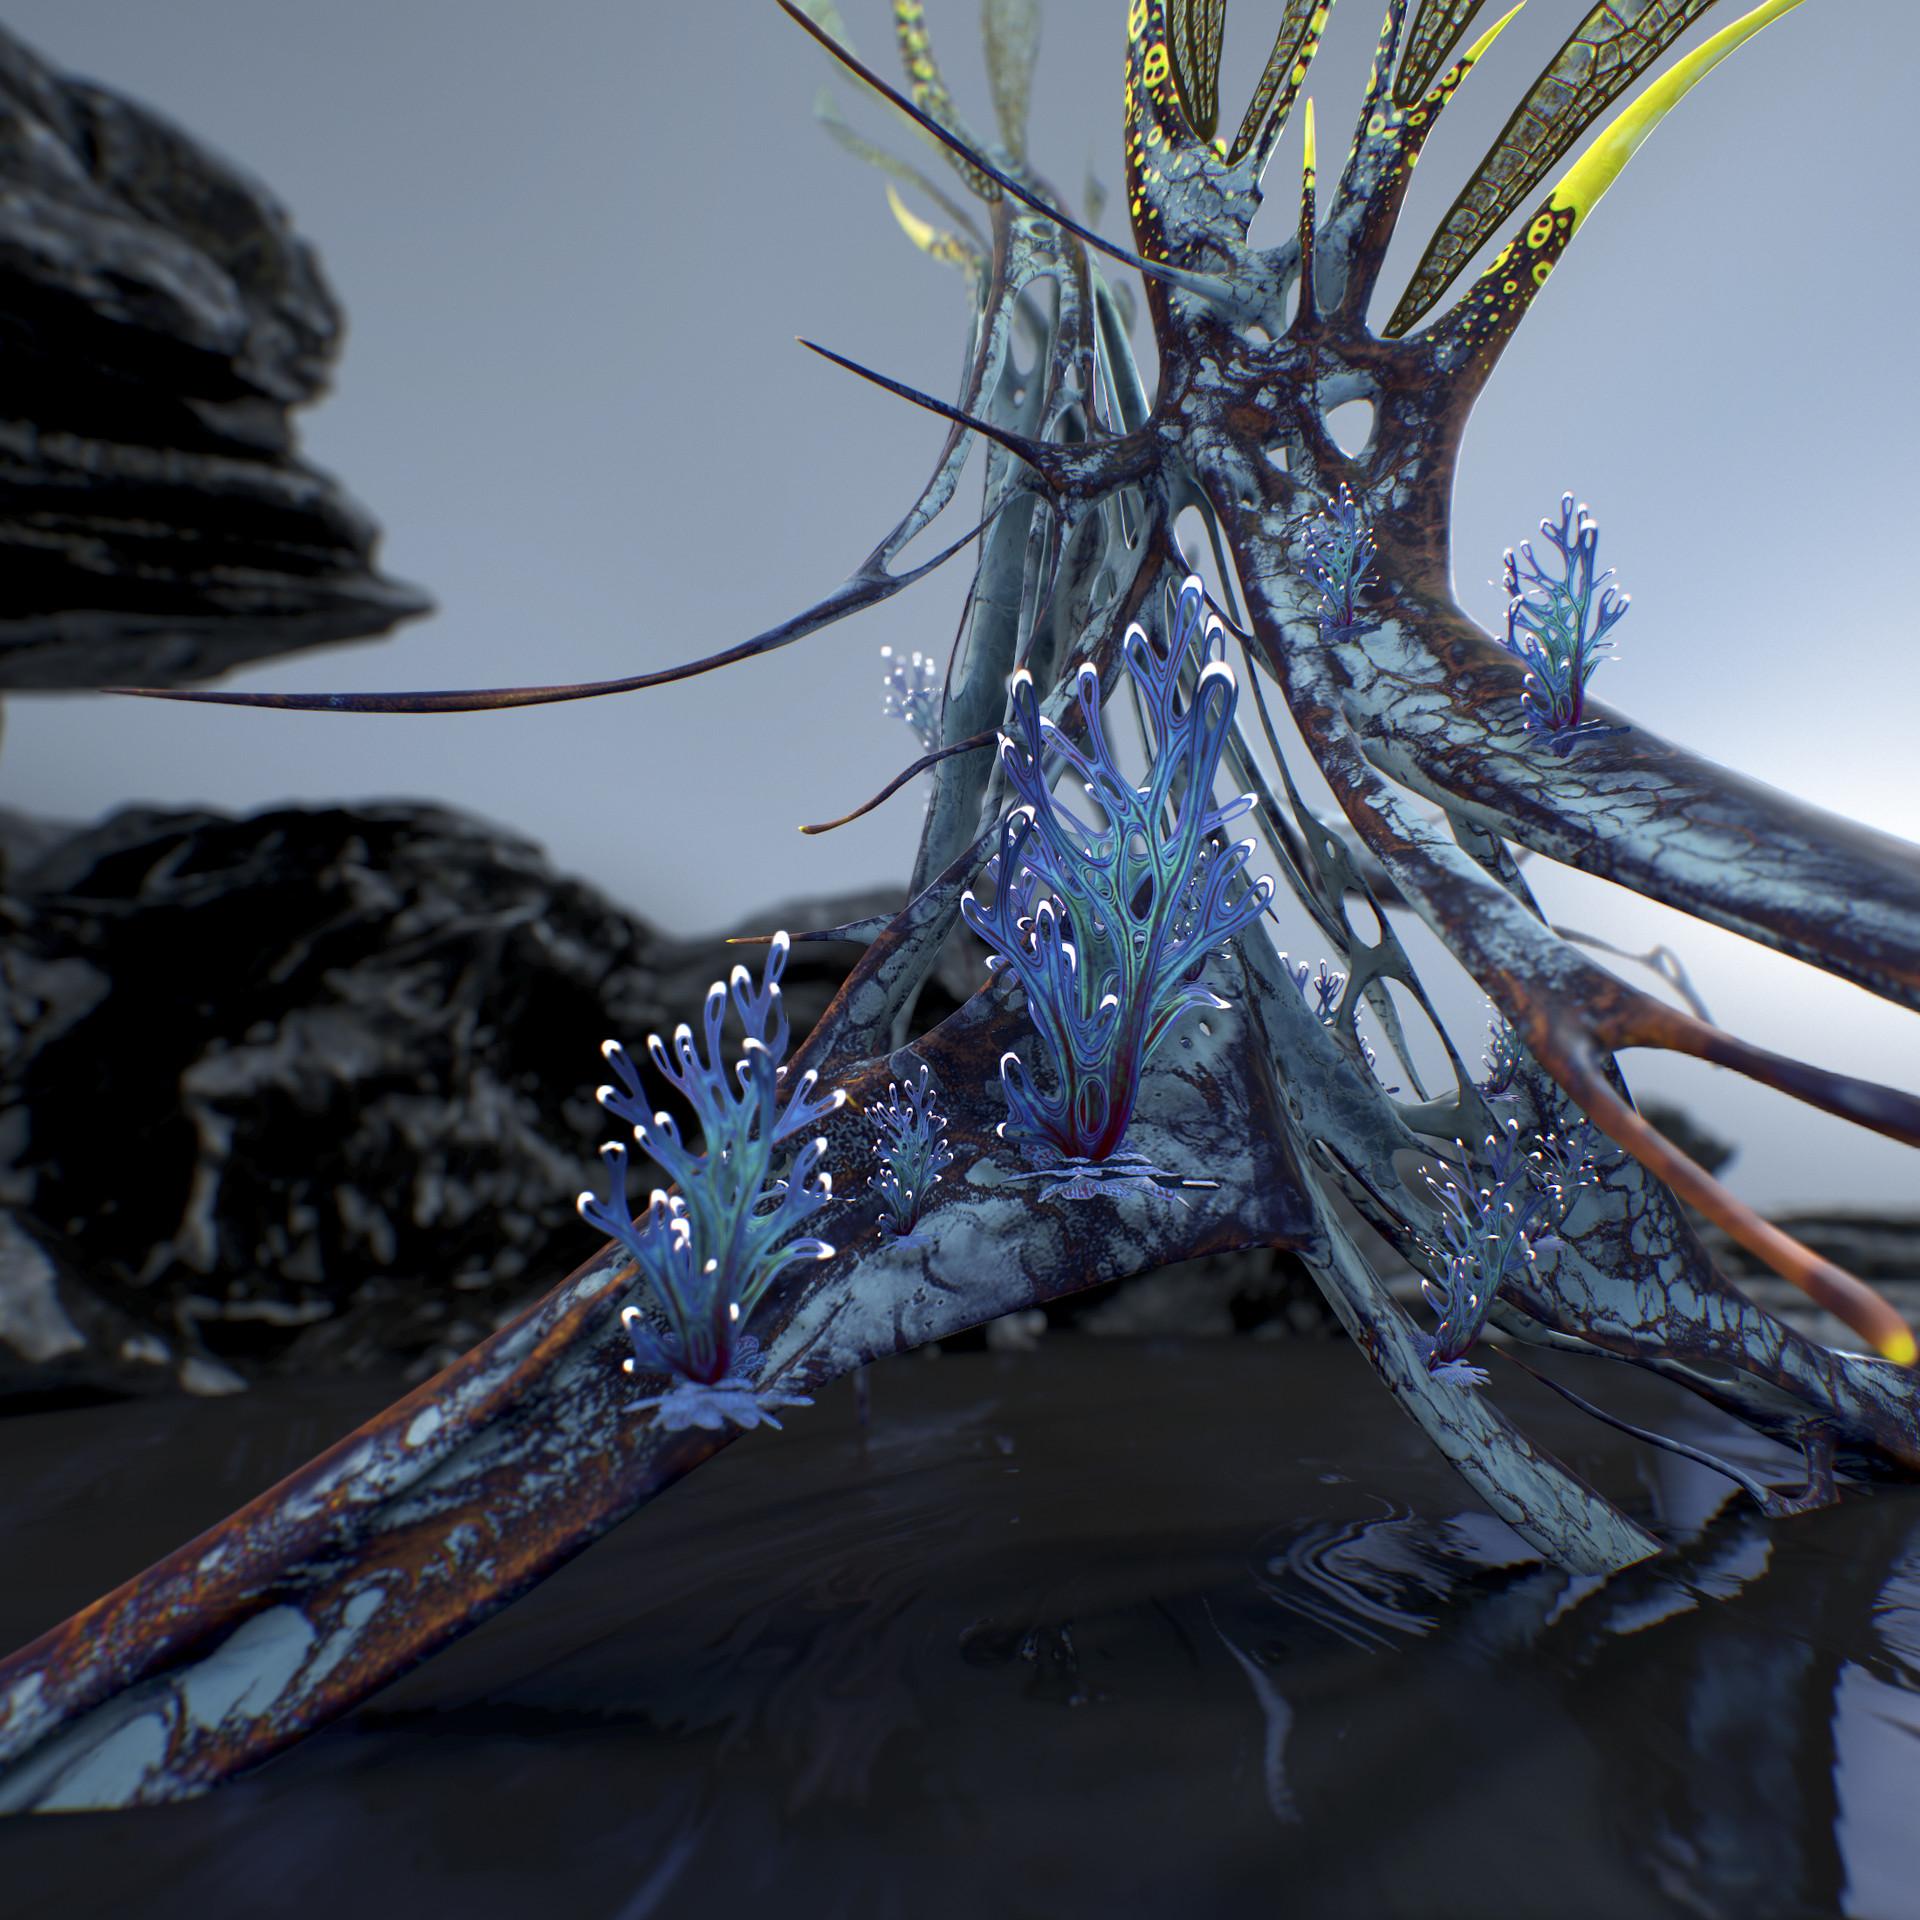 Johan de leenheer alien fern misota spletinus14